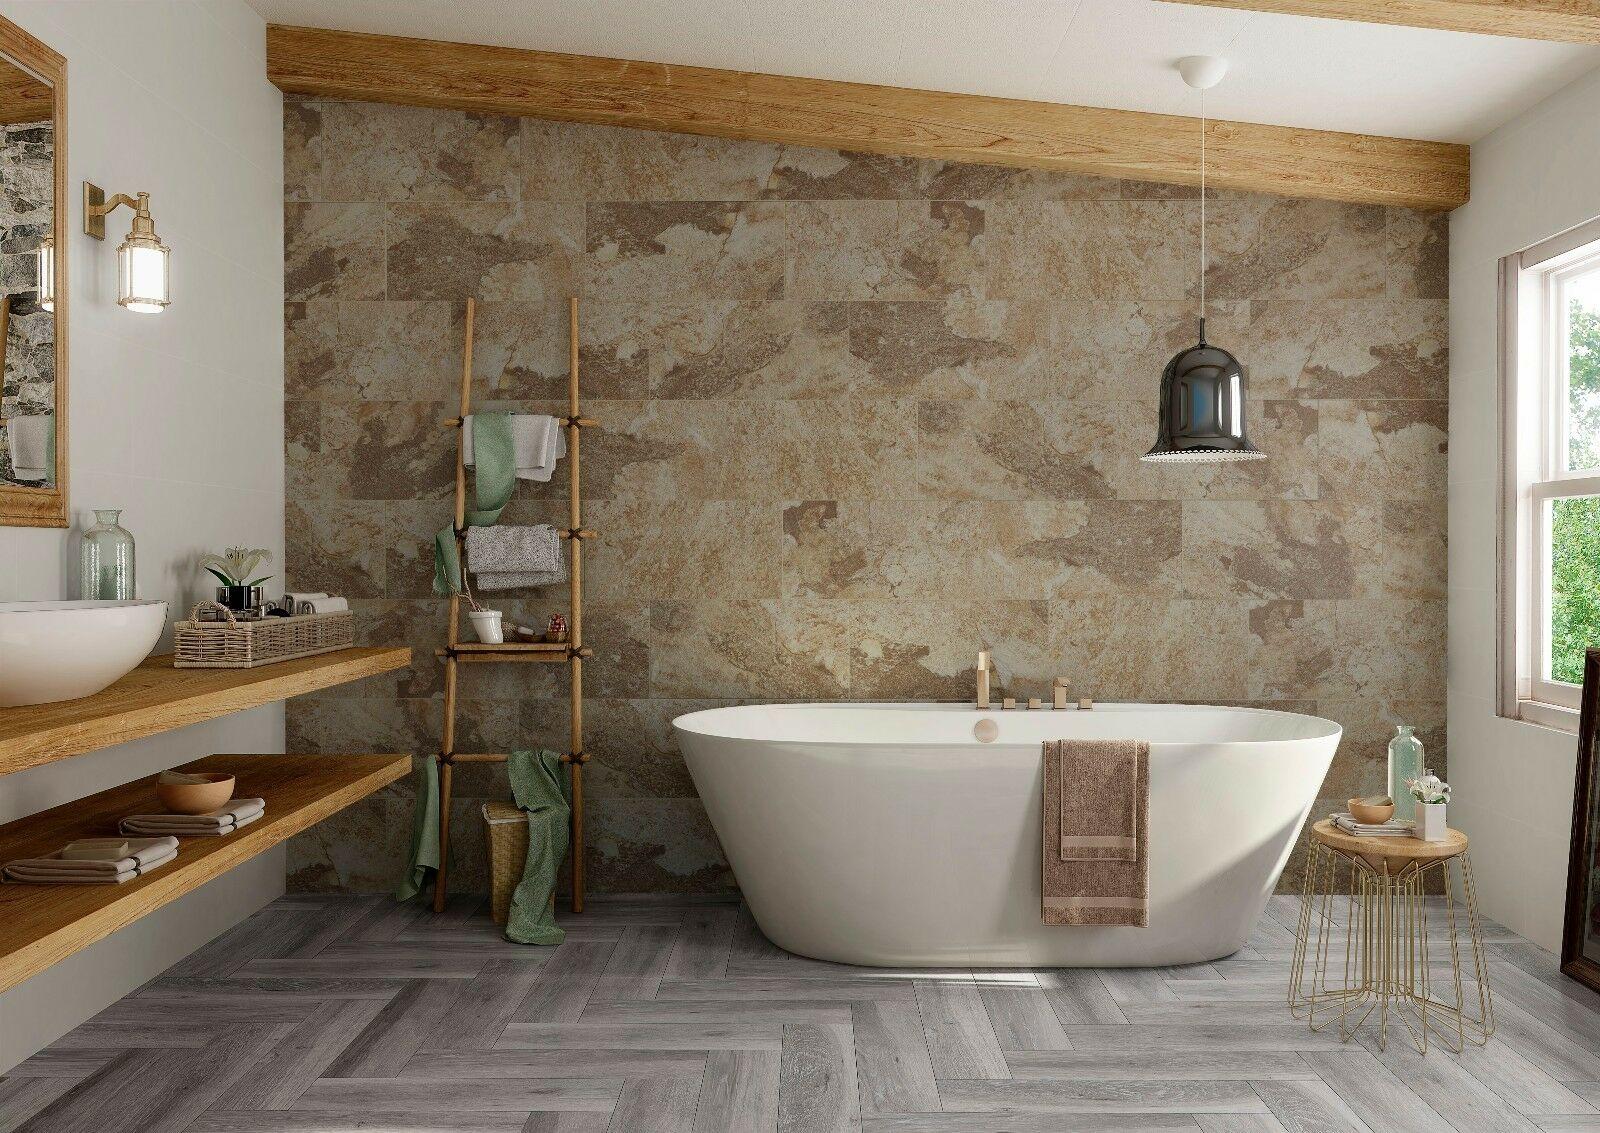 Natural Wood and Ceramic Tile Mix